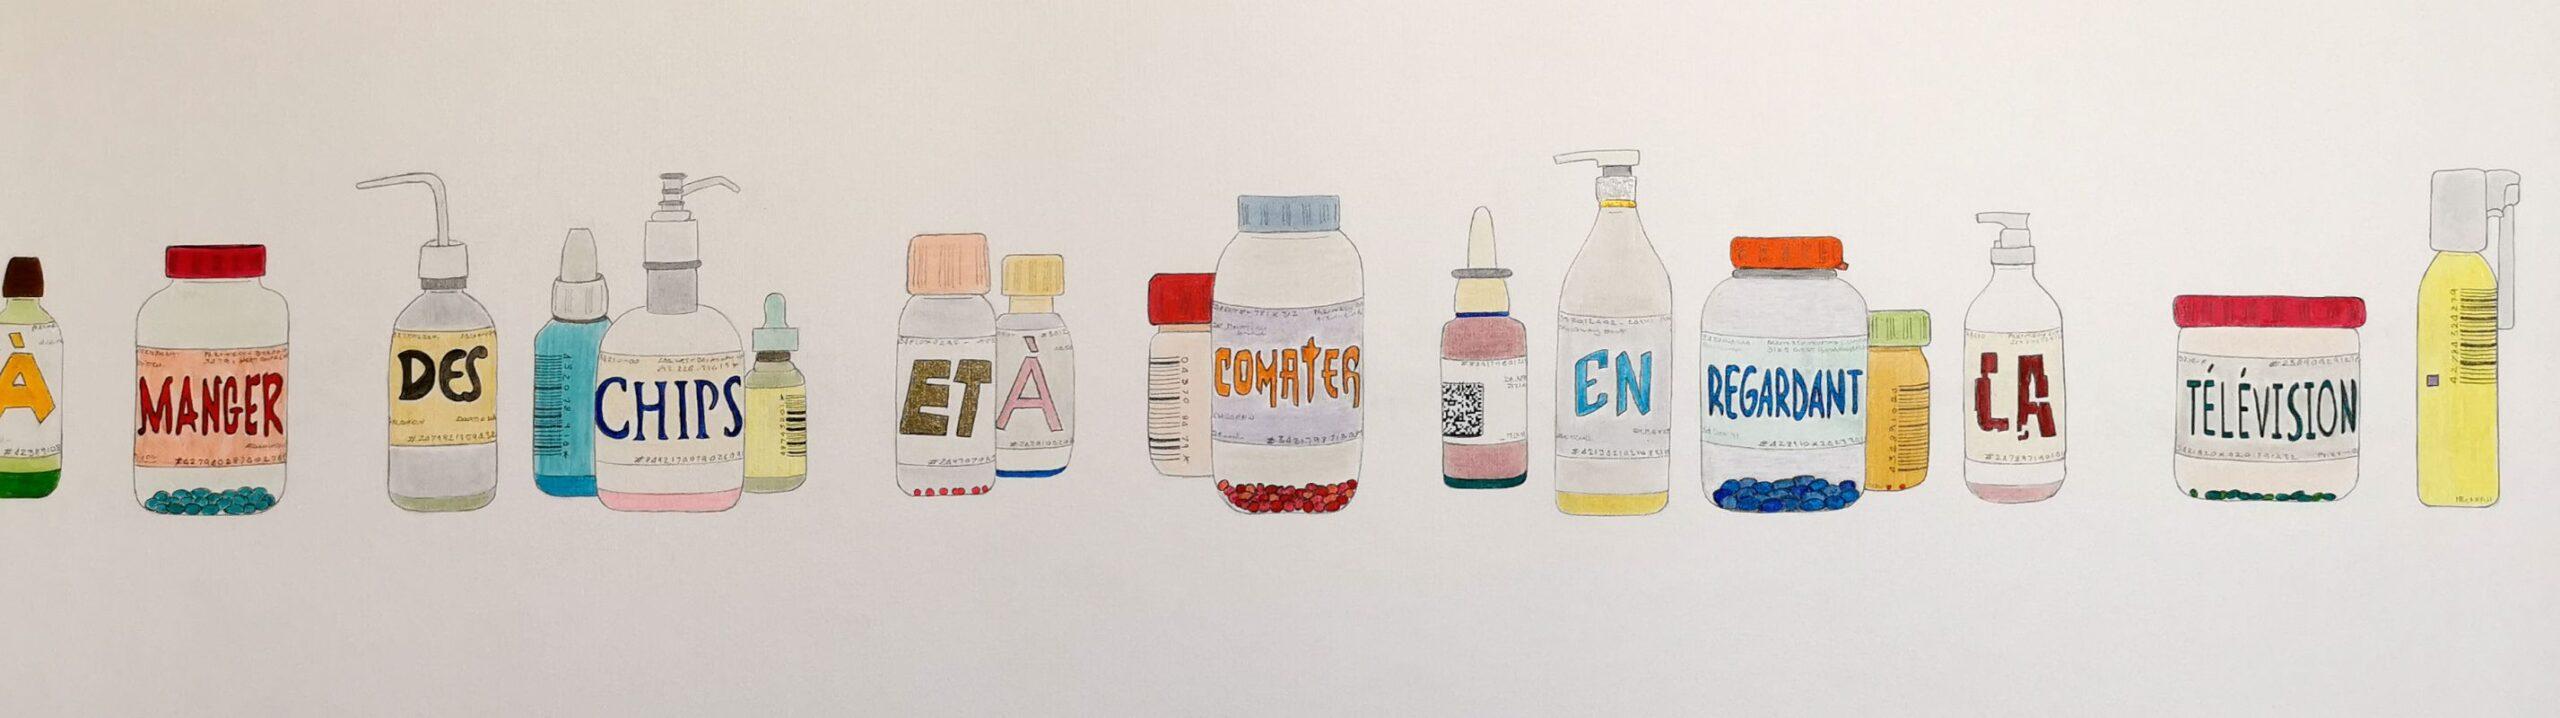 Jeanne Susplugas - Containers, 2020 - Pharmacopées au Musée Fabre